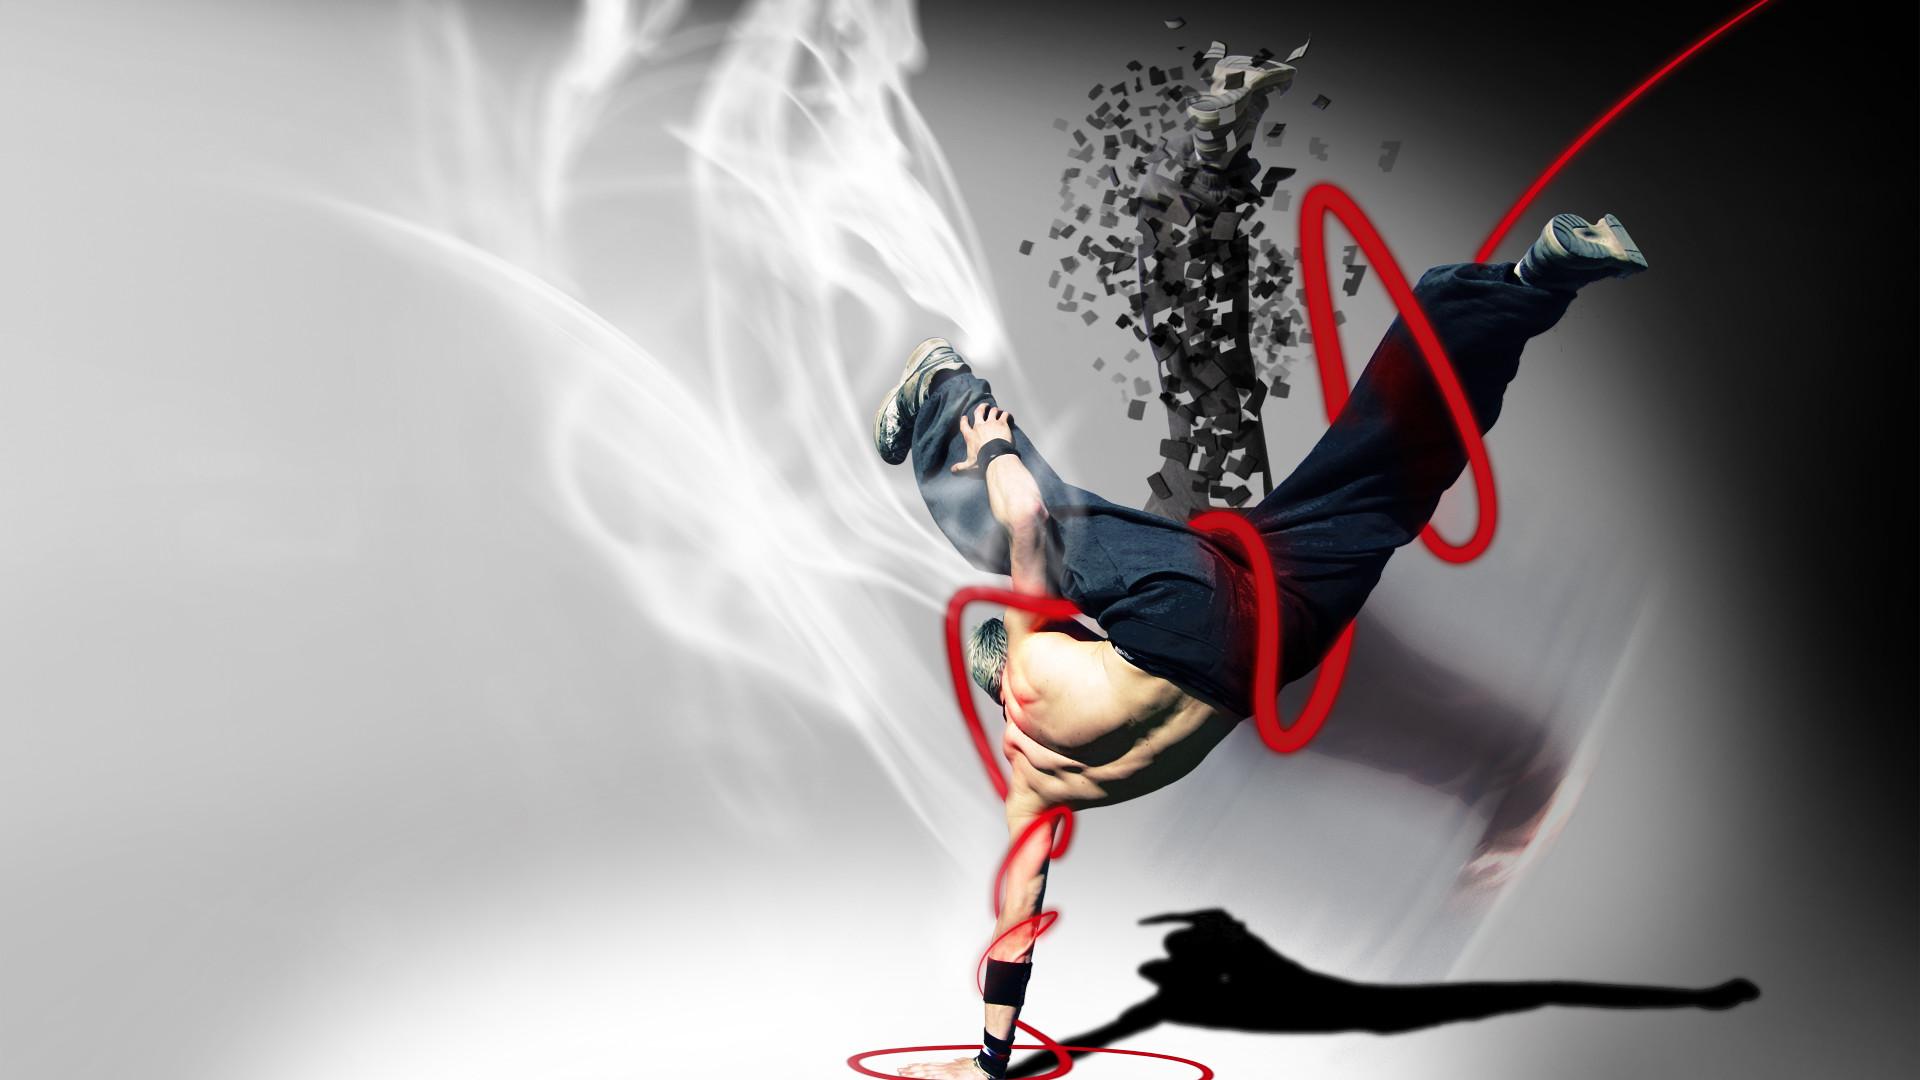 A-spectacular-dance-dangerous-movements_